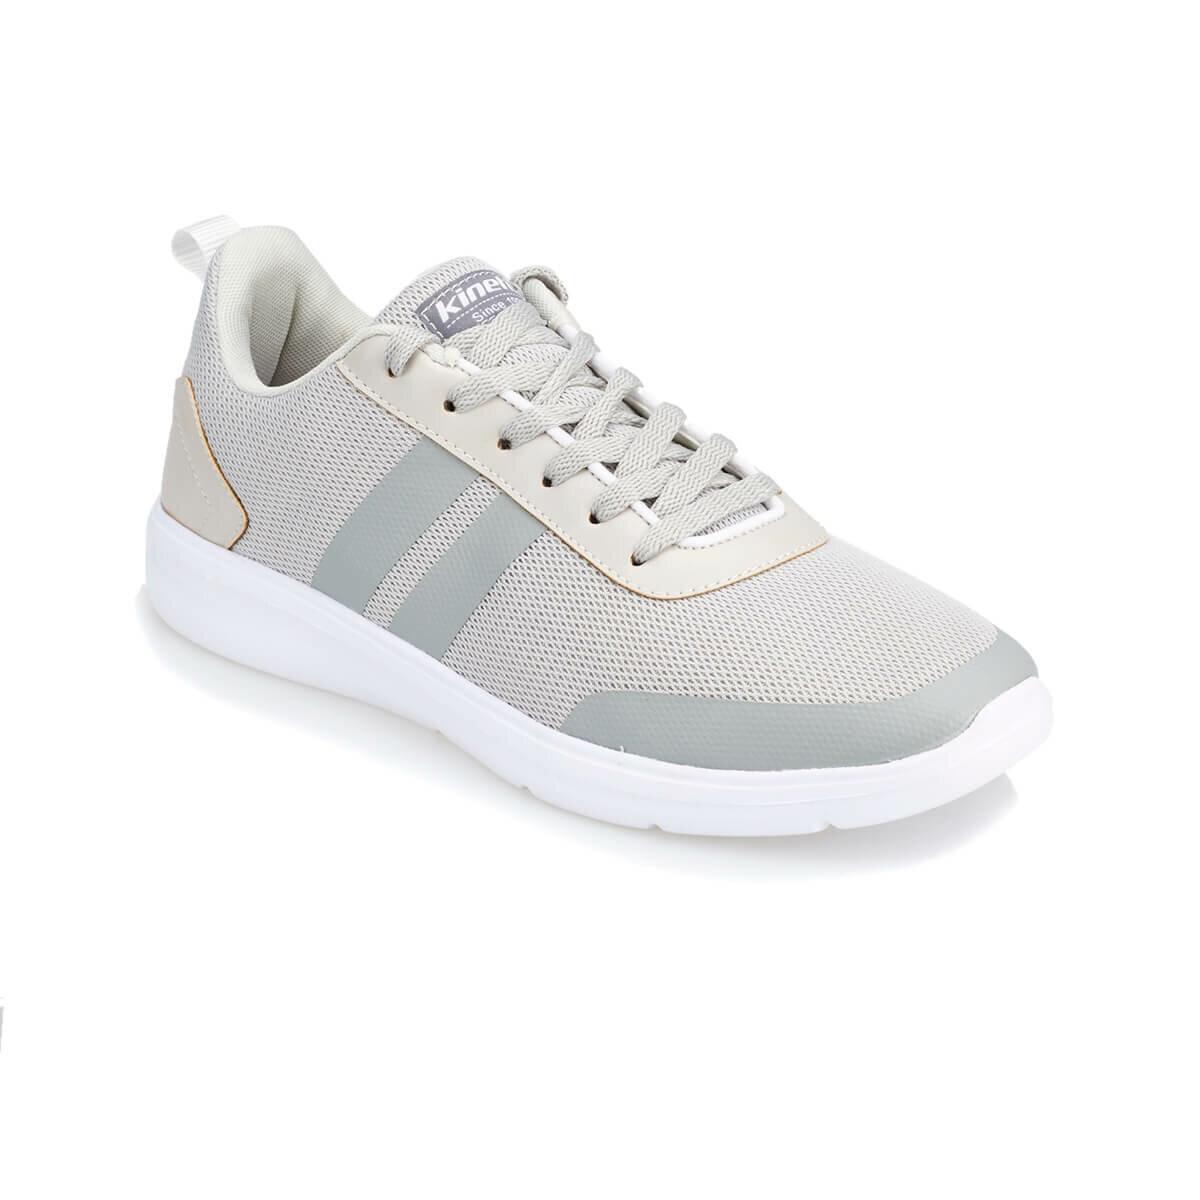 FLO THEHA Gray Men Shoes KINETIX